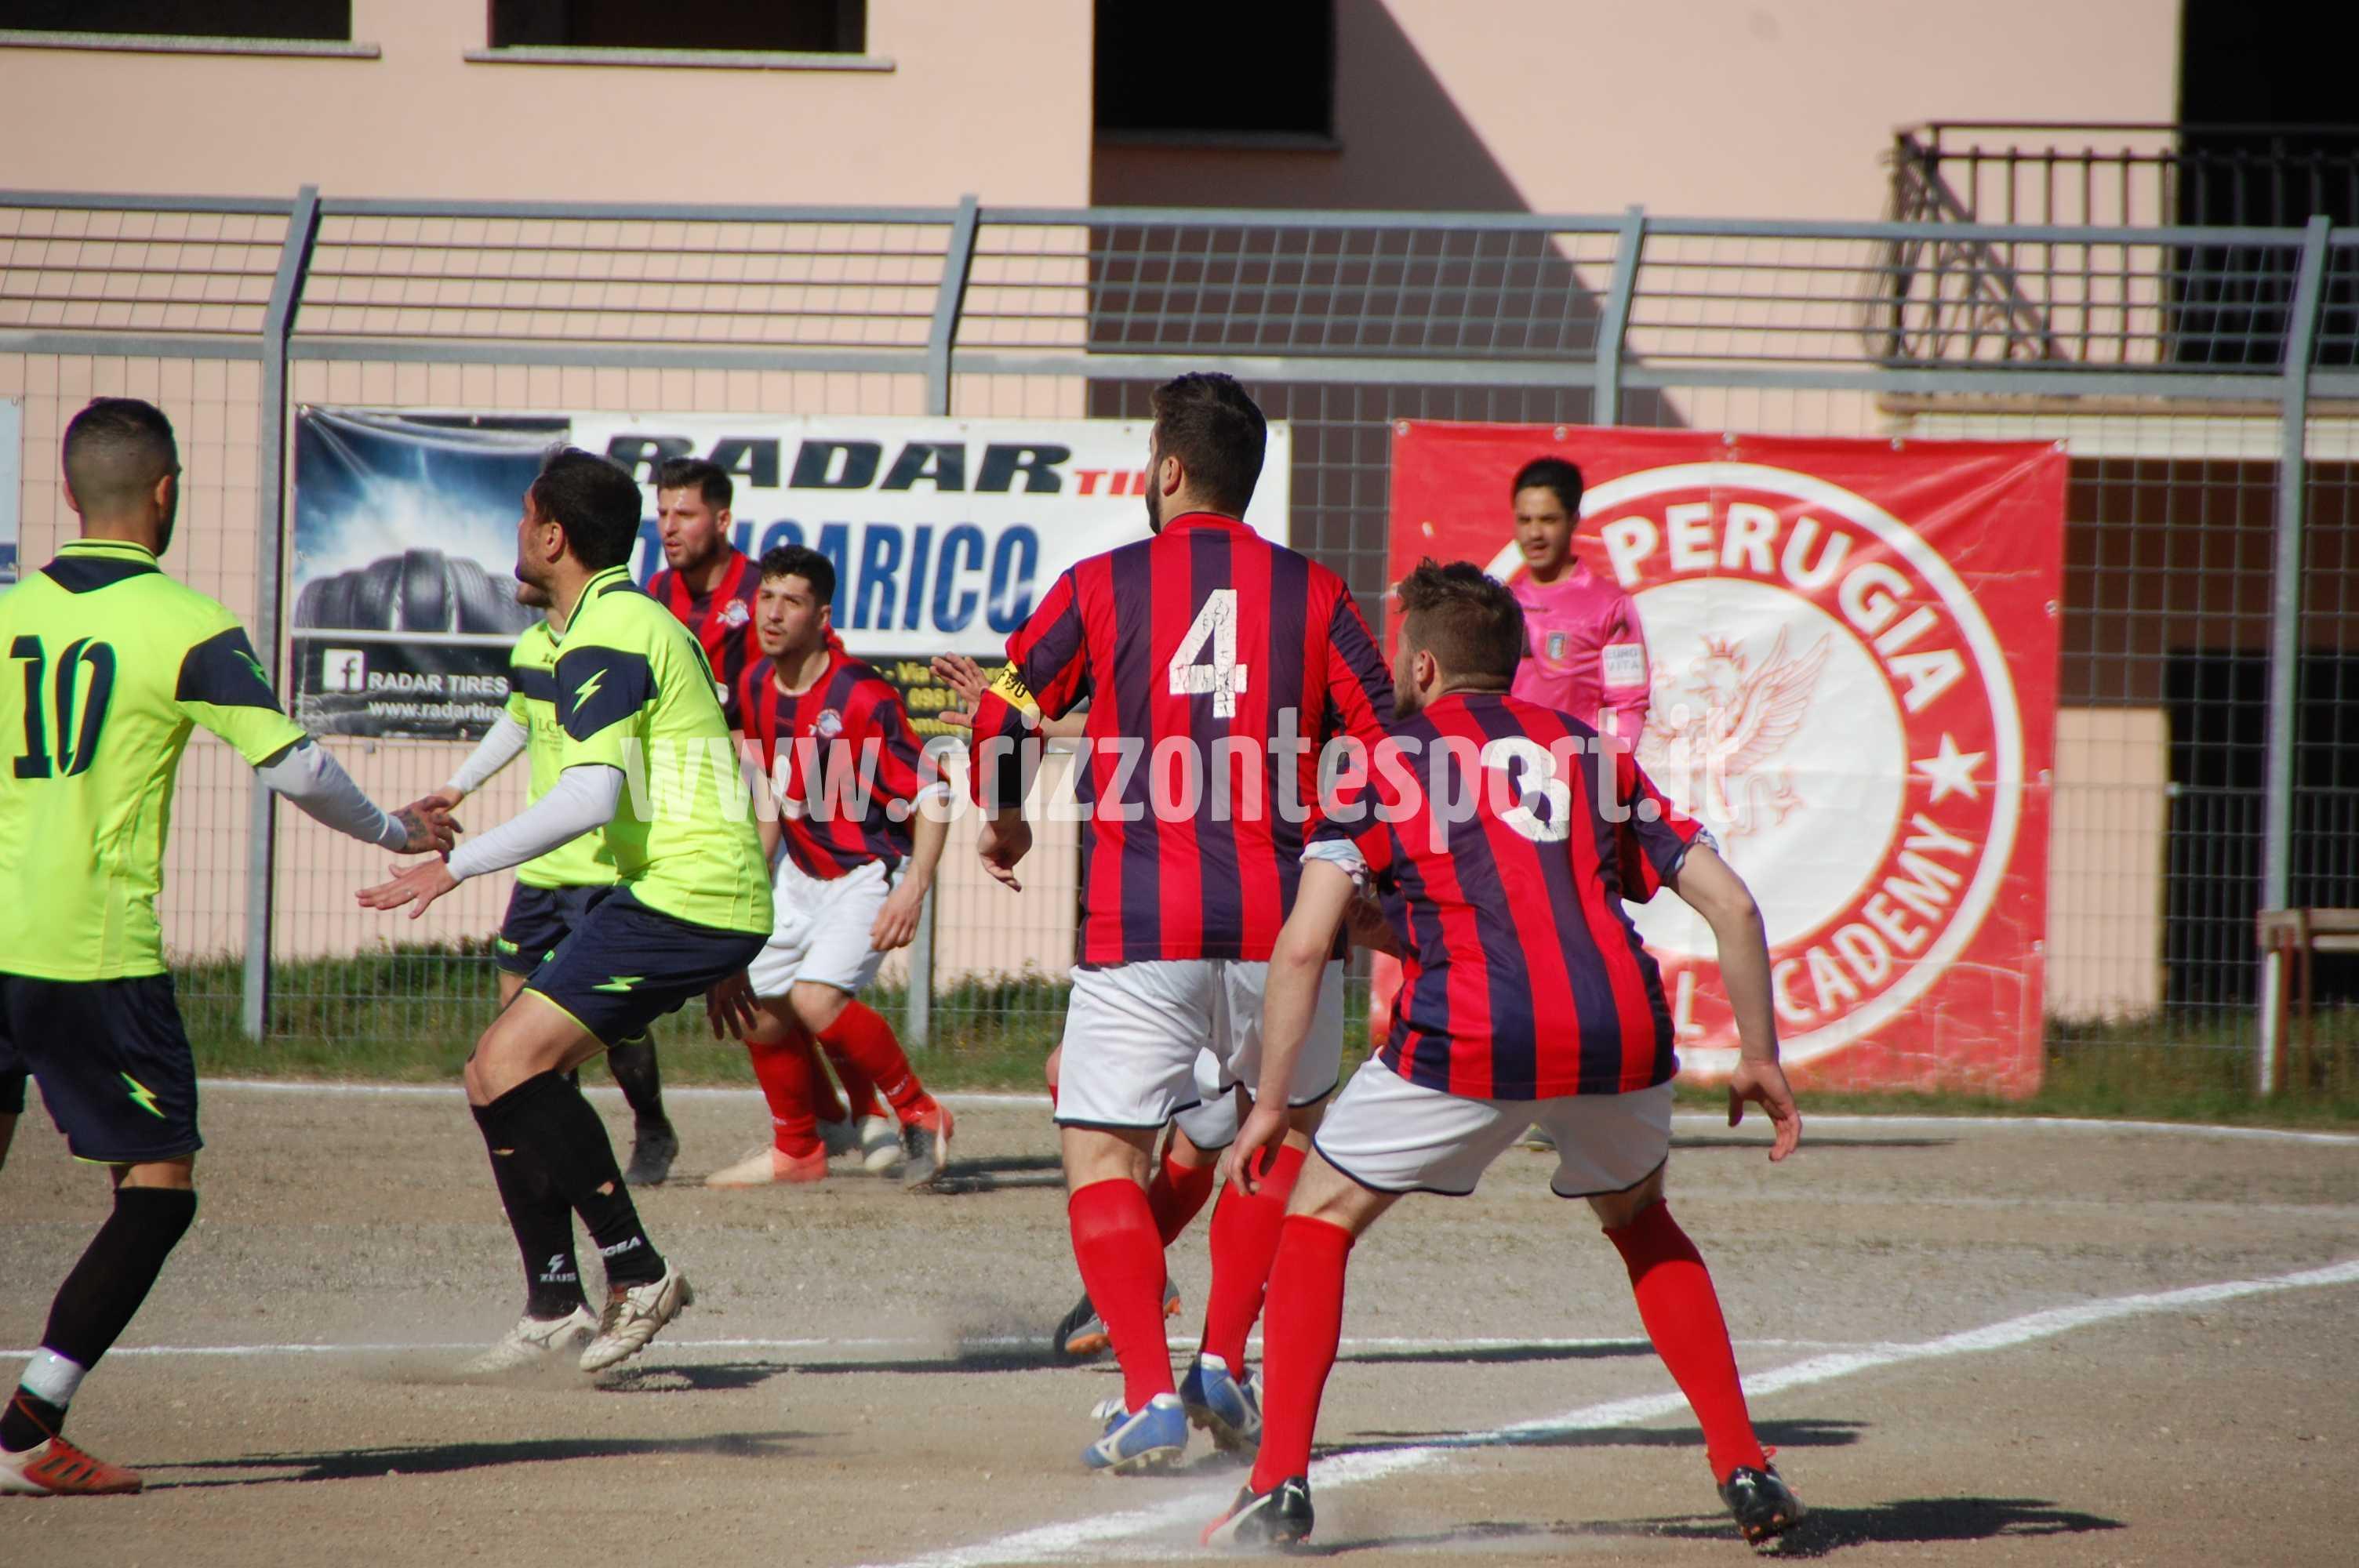 gnettimorano_praiatortora (33)